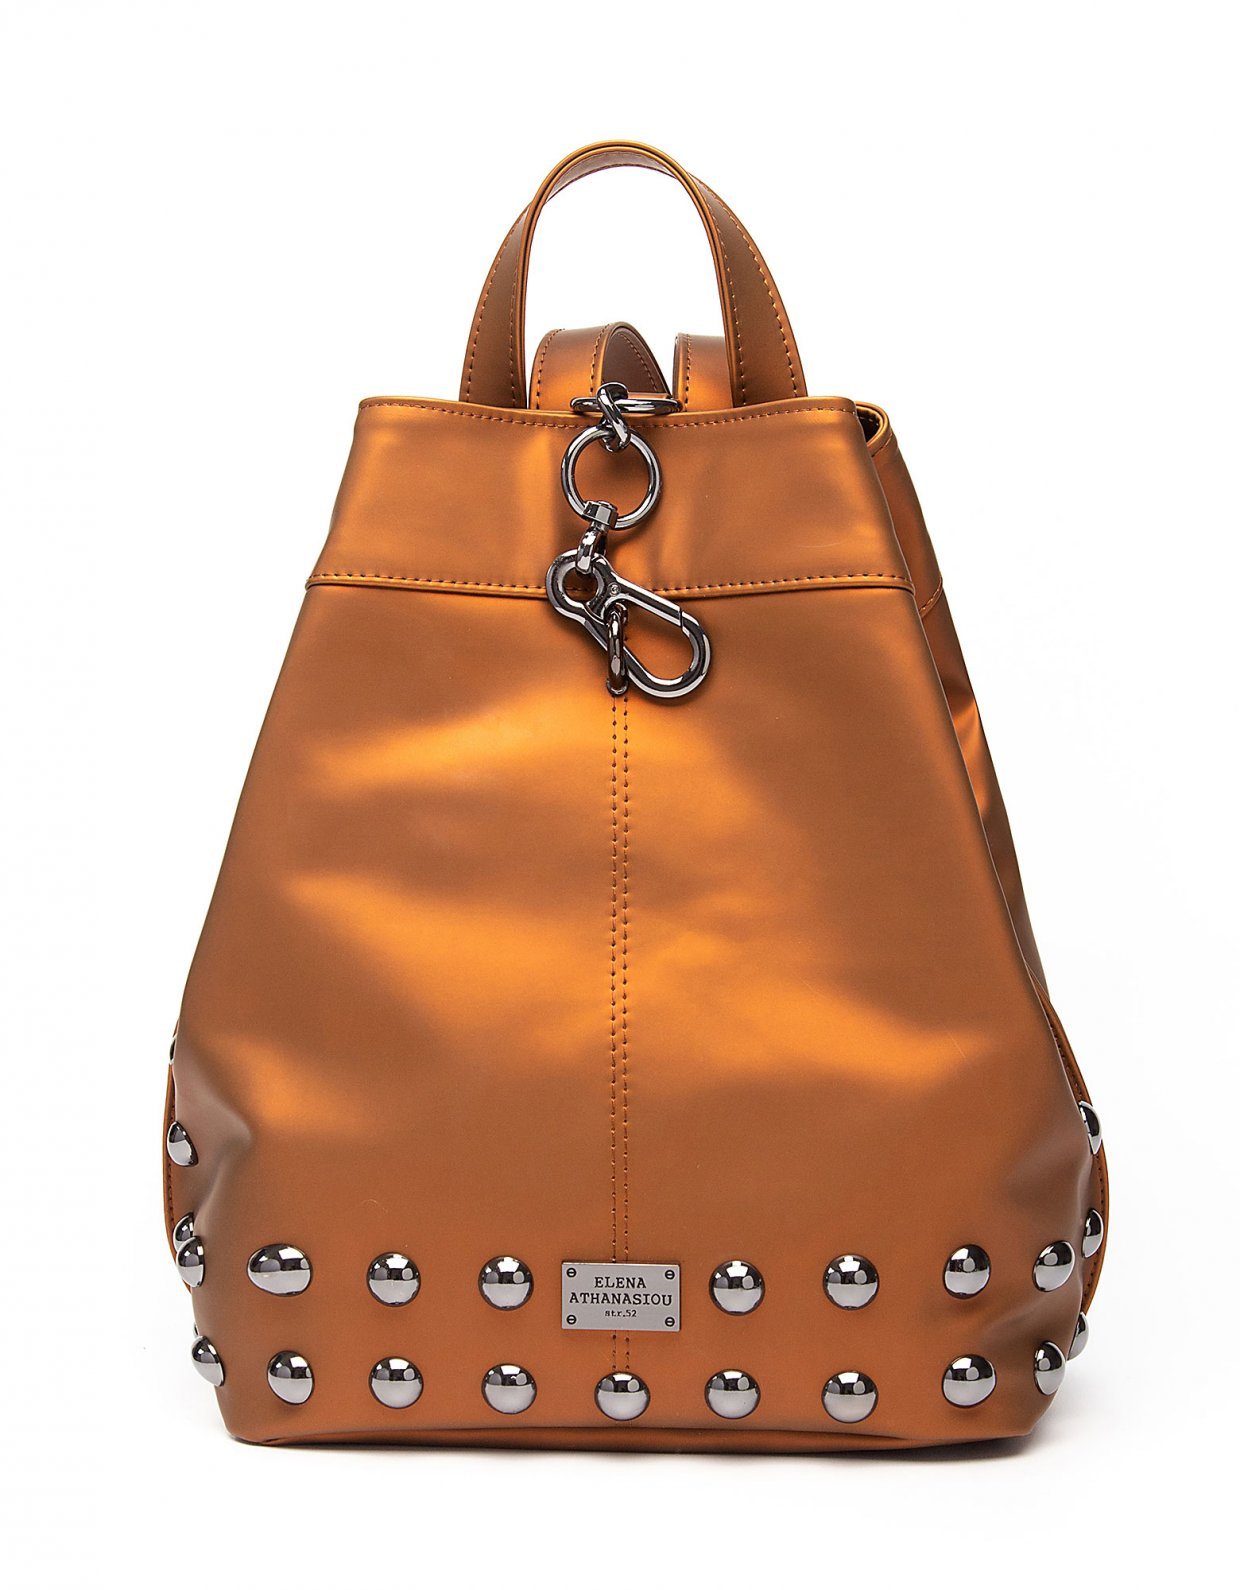 Elena Athanasiou Backpack caramel cognac